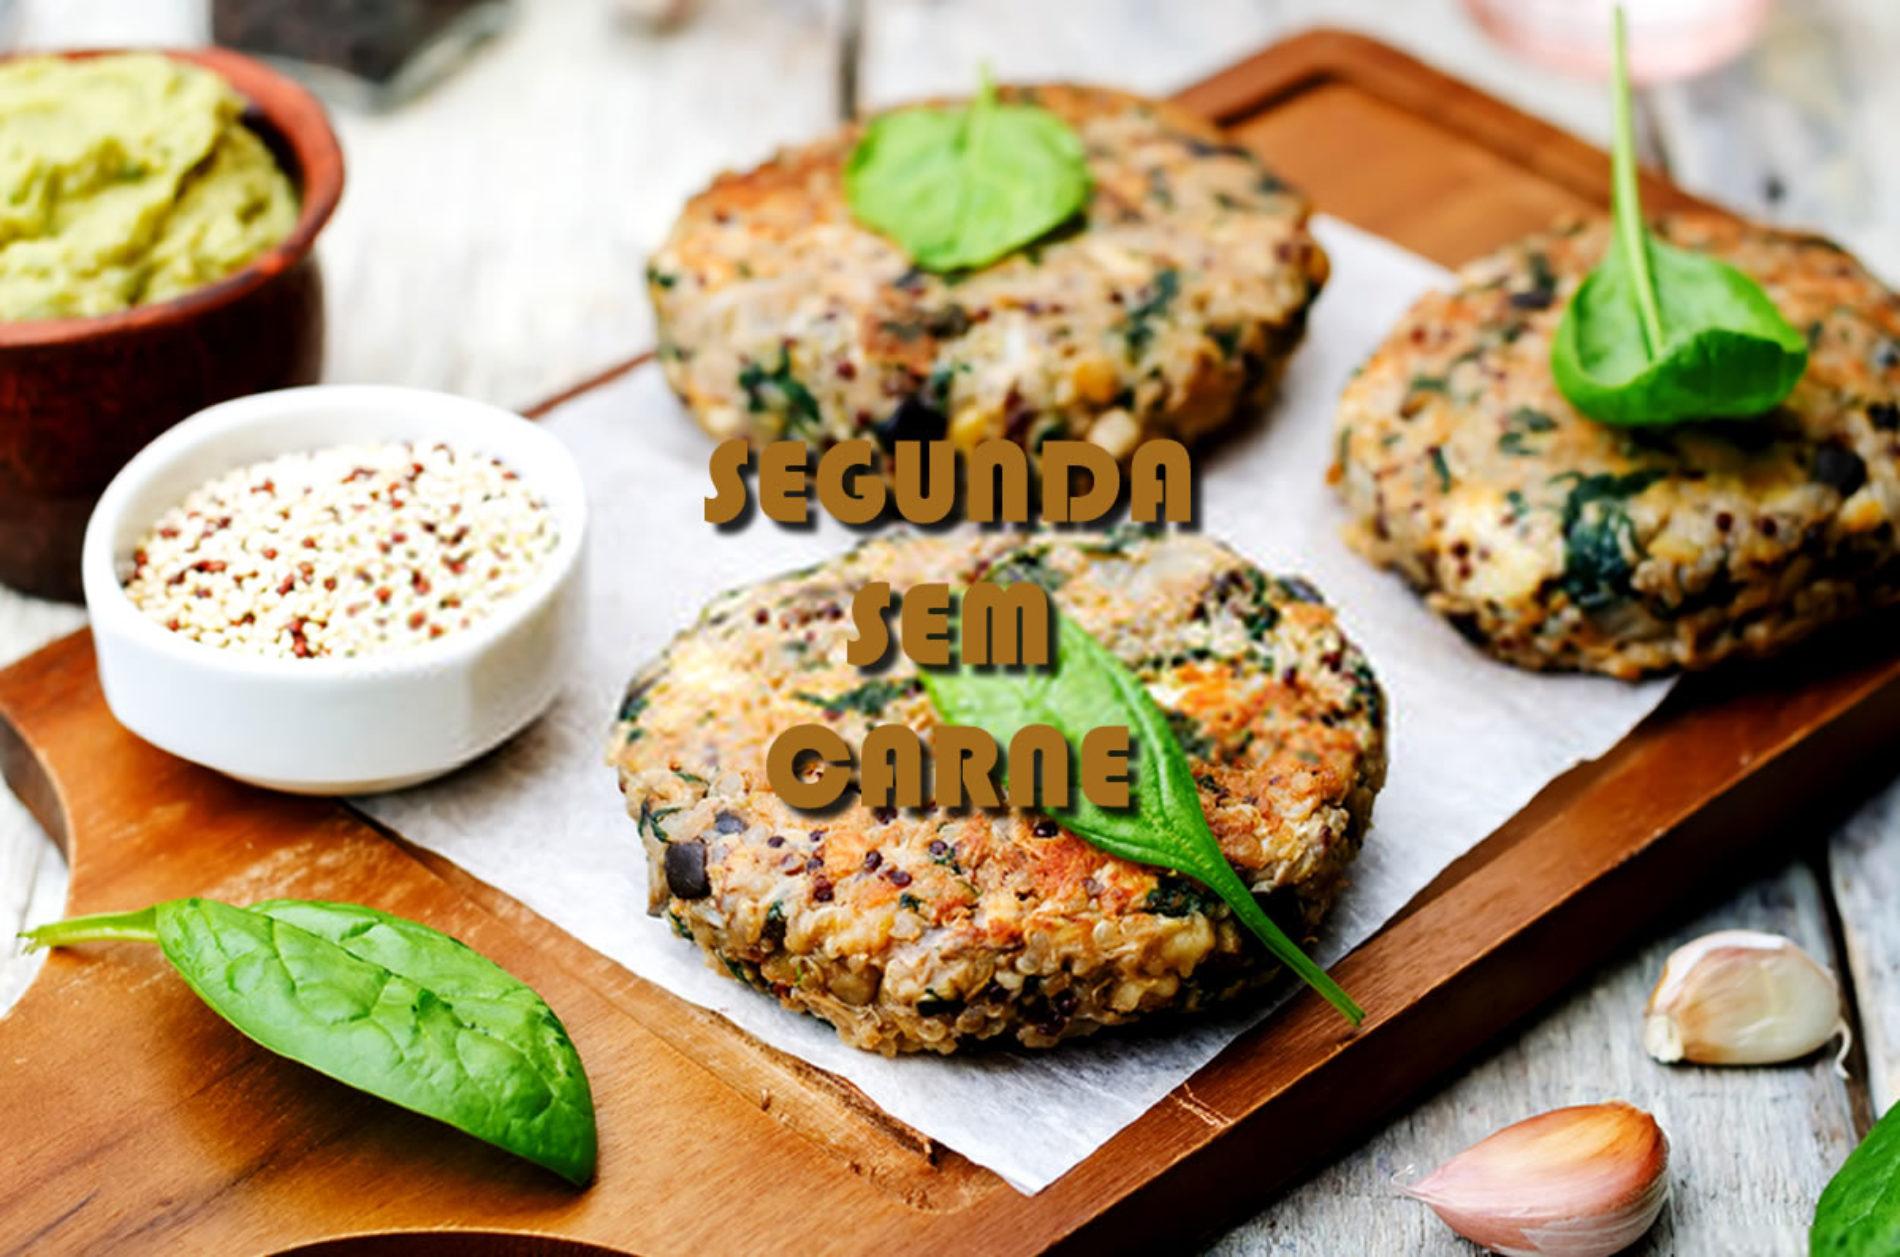 Monday without meat. Troque a proteína animal uma vez na semana